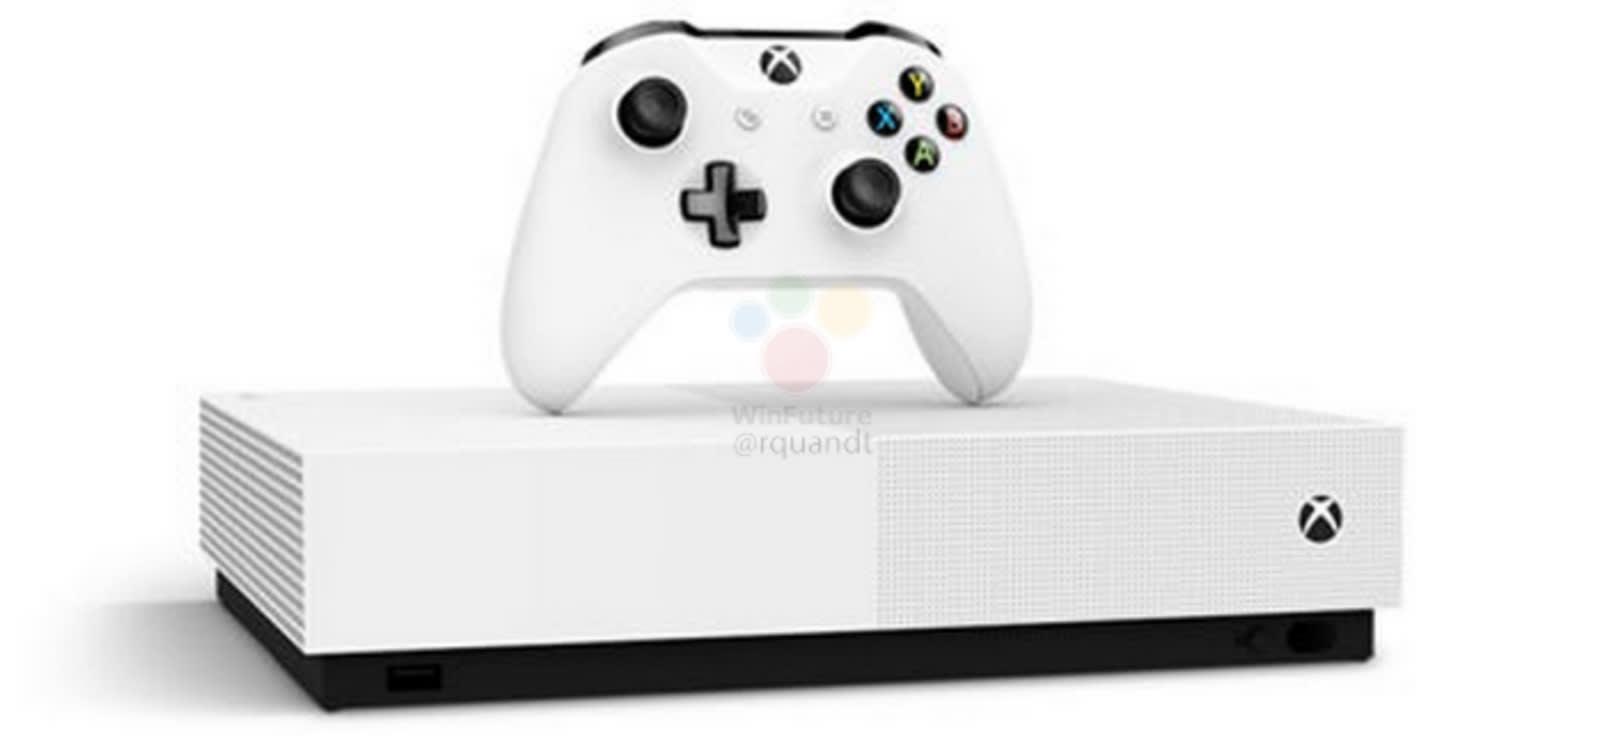 Leak shows Microsoft's 'All Digital' Xbox One S